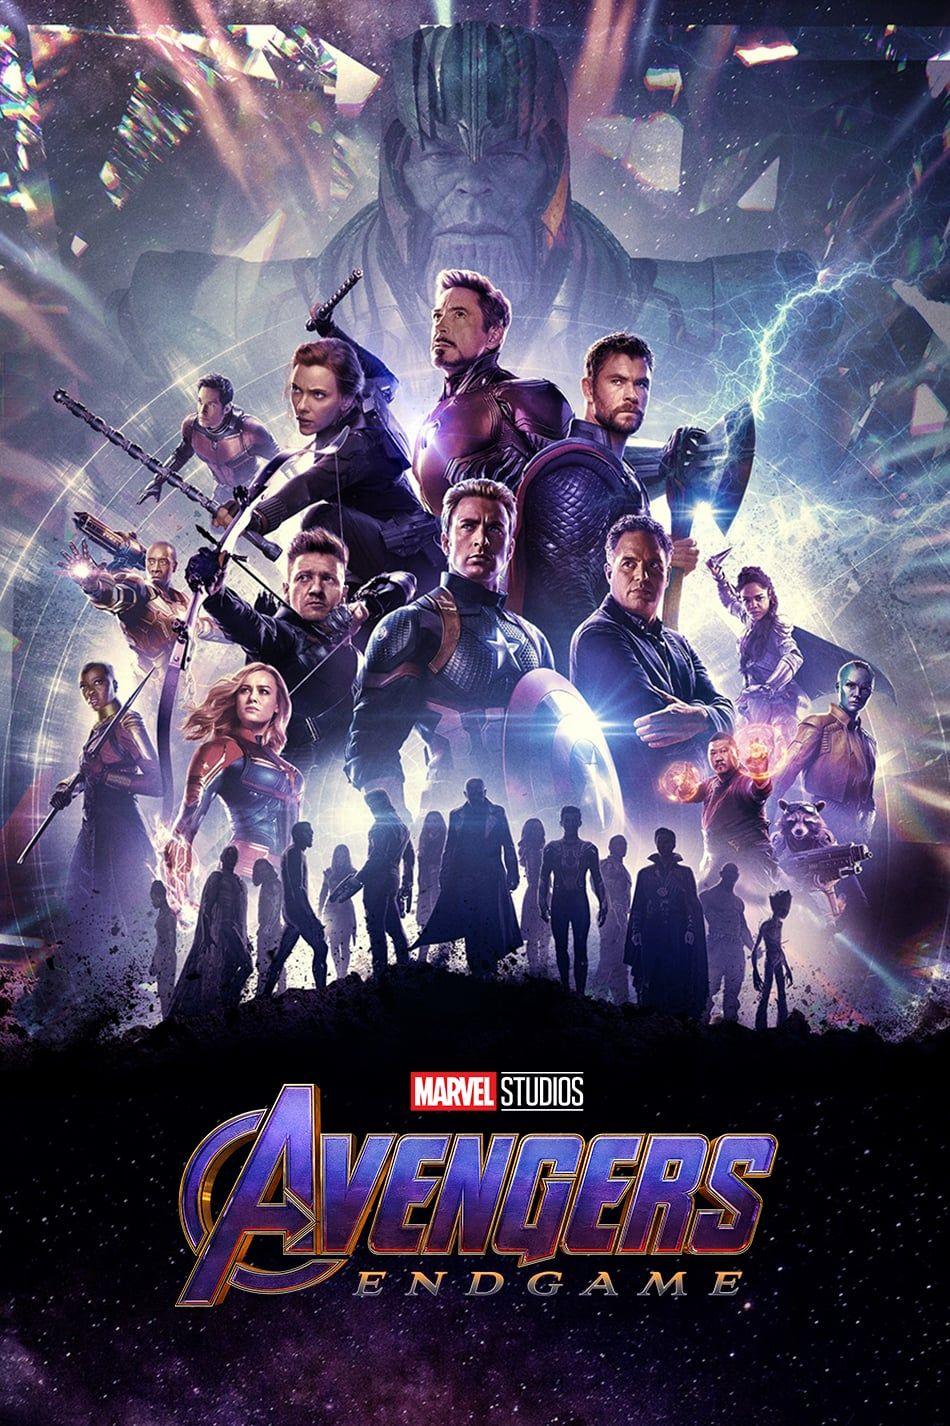 Ver Vengadores Endgame Pelicula Completa En Espanol Latino 1080p Marvel Superheroes Marvel Wallpaper Marvel Background